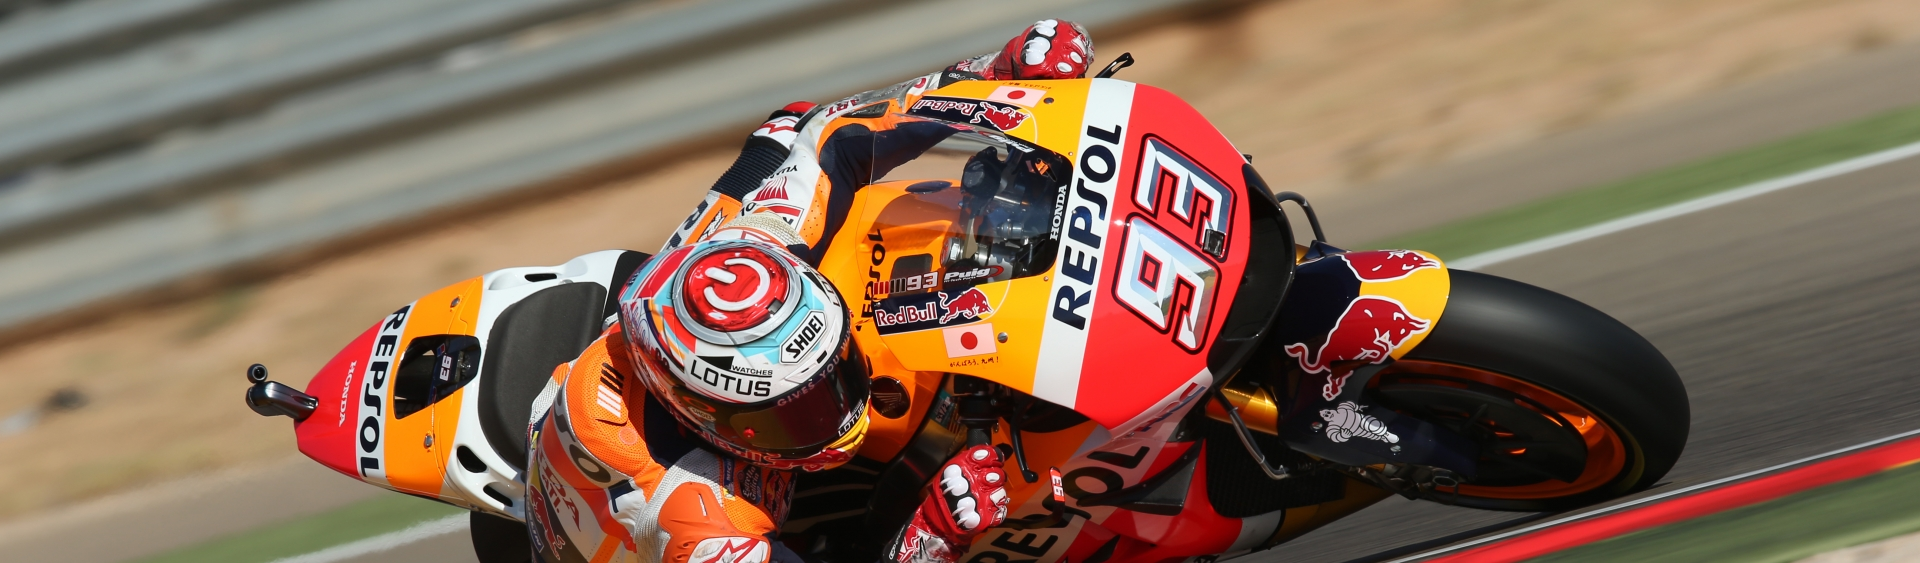 MotoGP | Honda Pro Racing